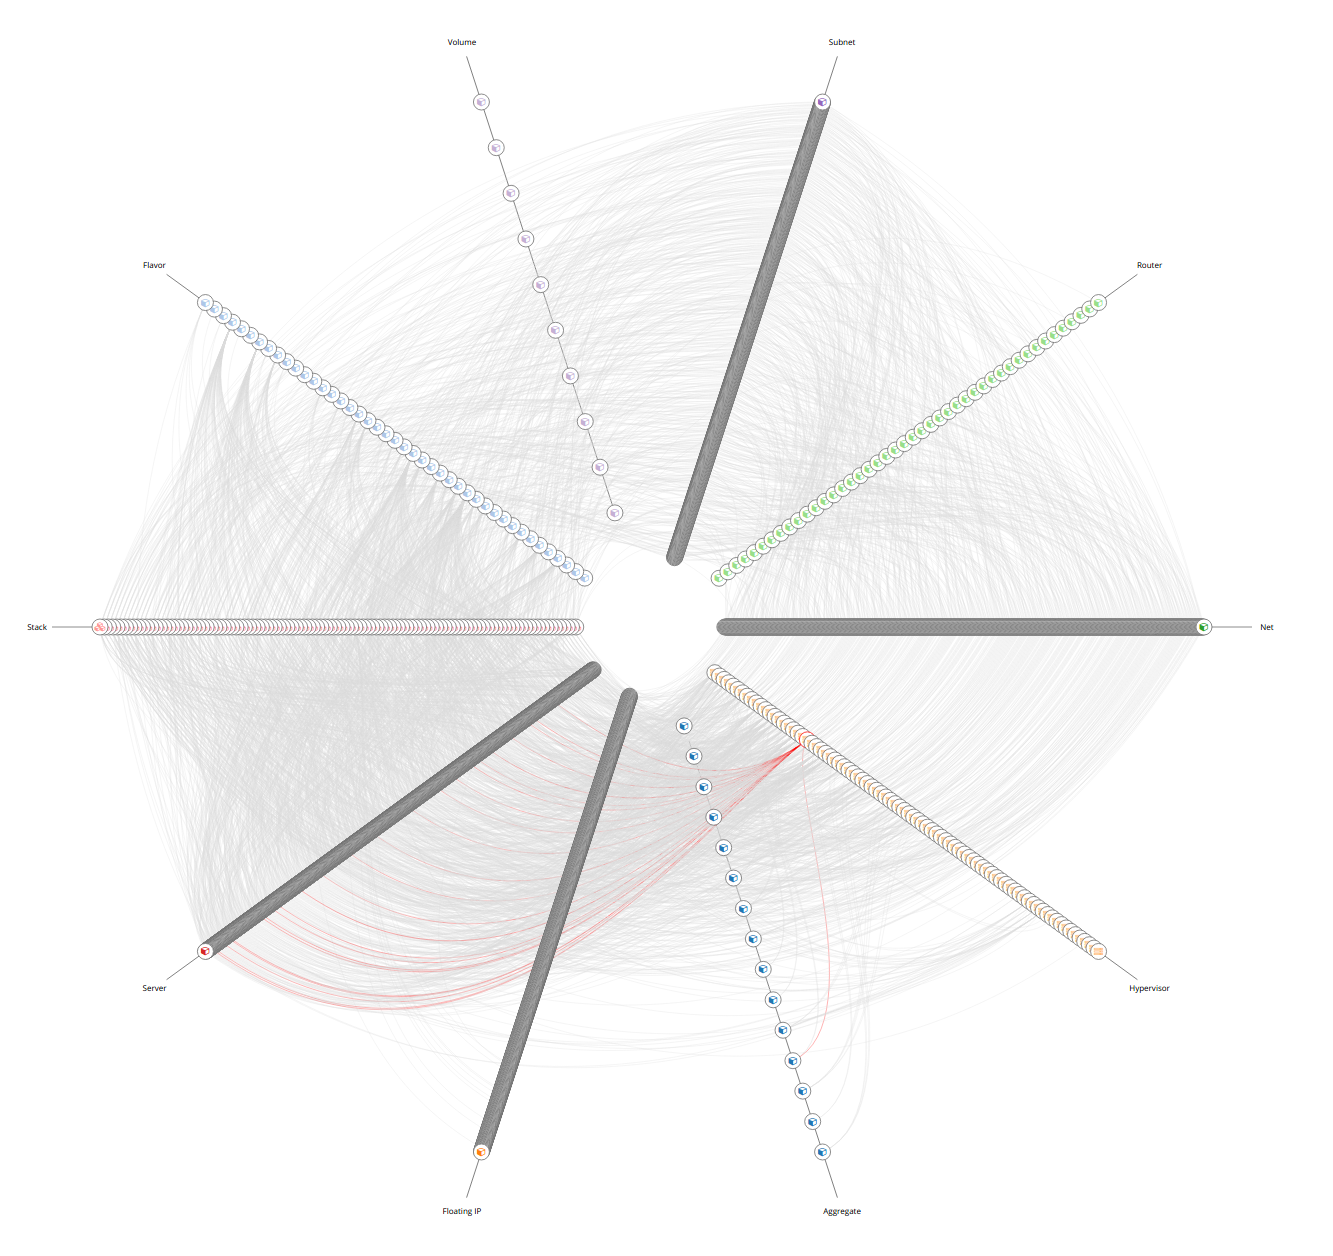 ./doc/source/static/img/hive-plot.png